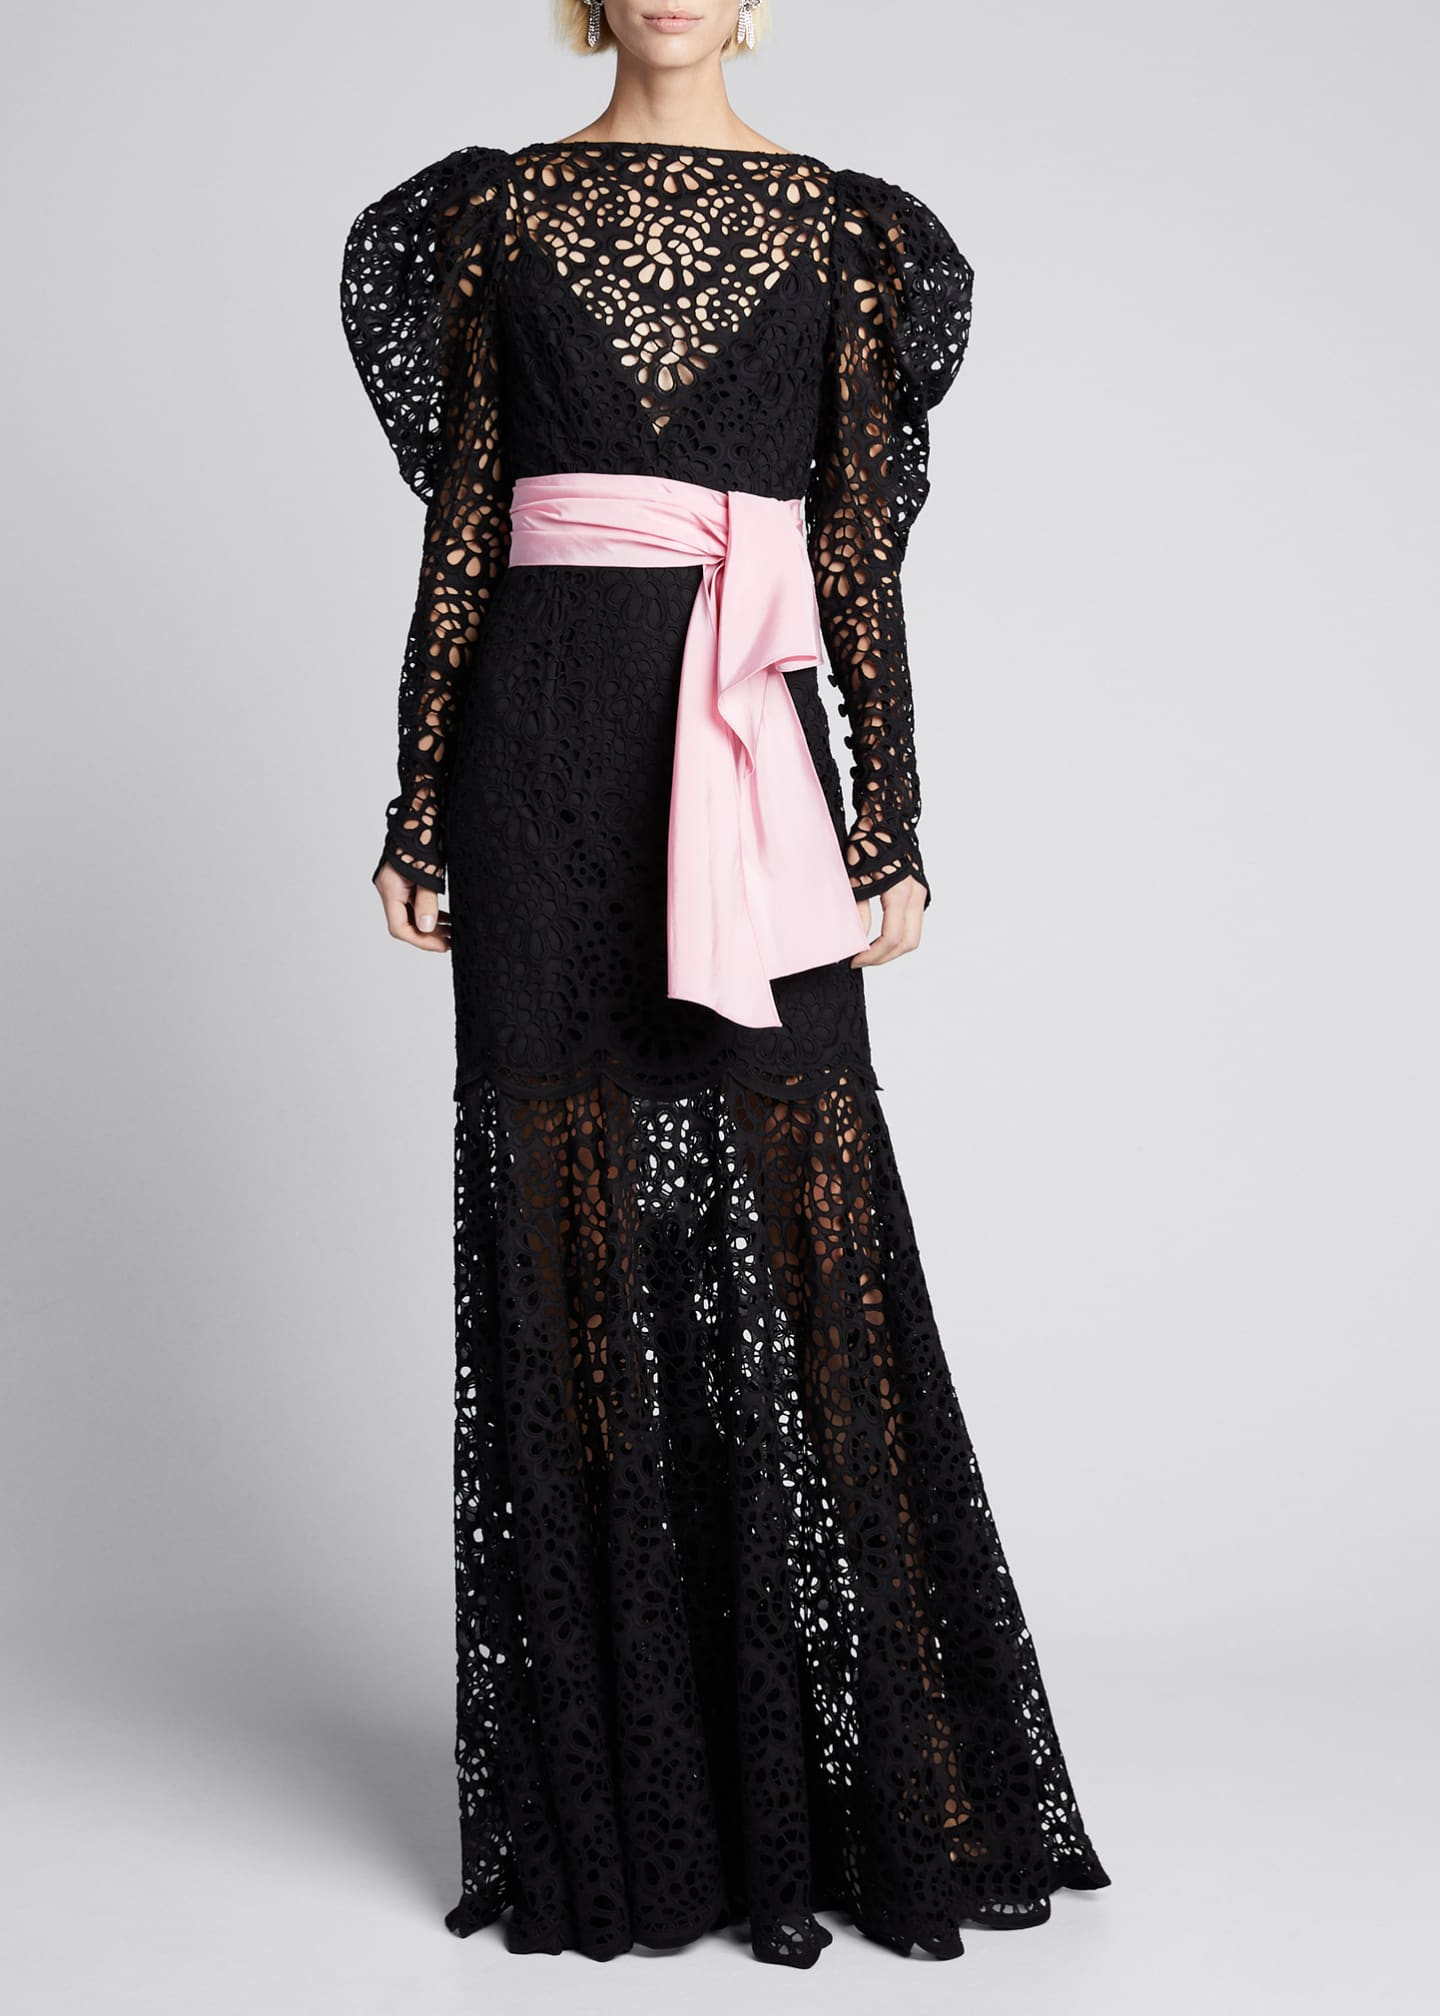 Carolina Herrera Puff-Sleeve Lace Illusion Gown